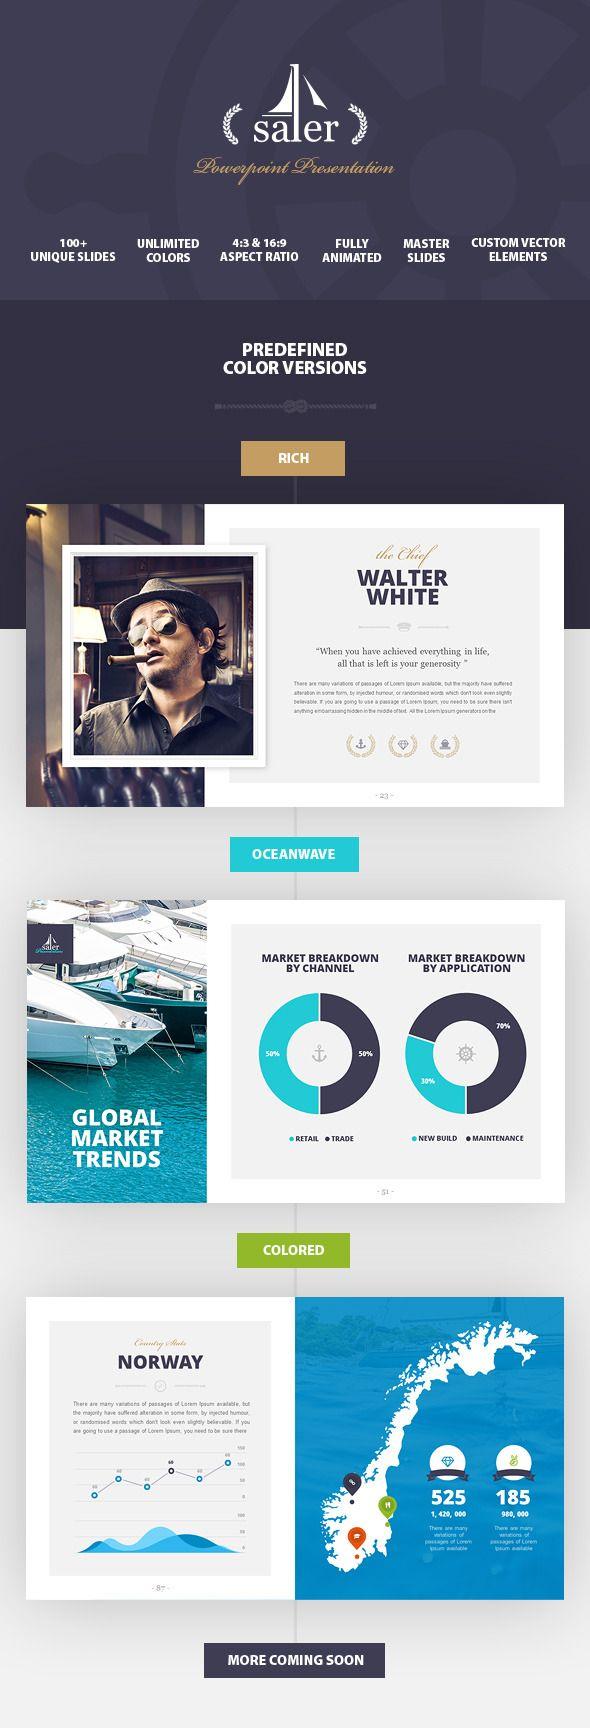 Salor - Powerpoint Presentation Template  #portfolio #ship #shipping #stylish #yacht #$15